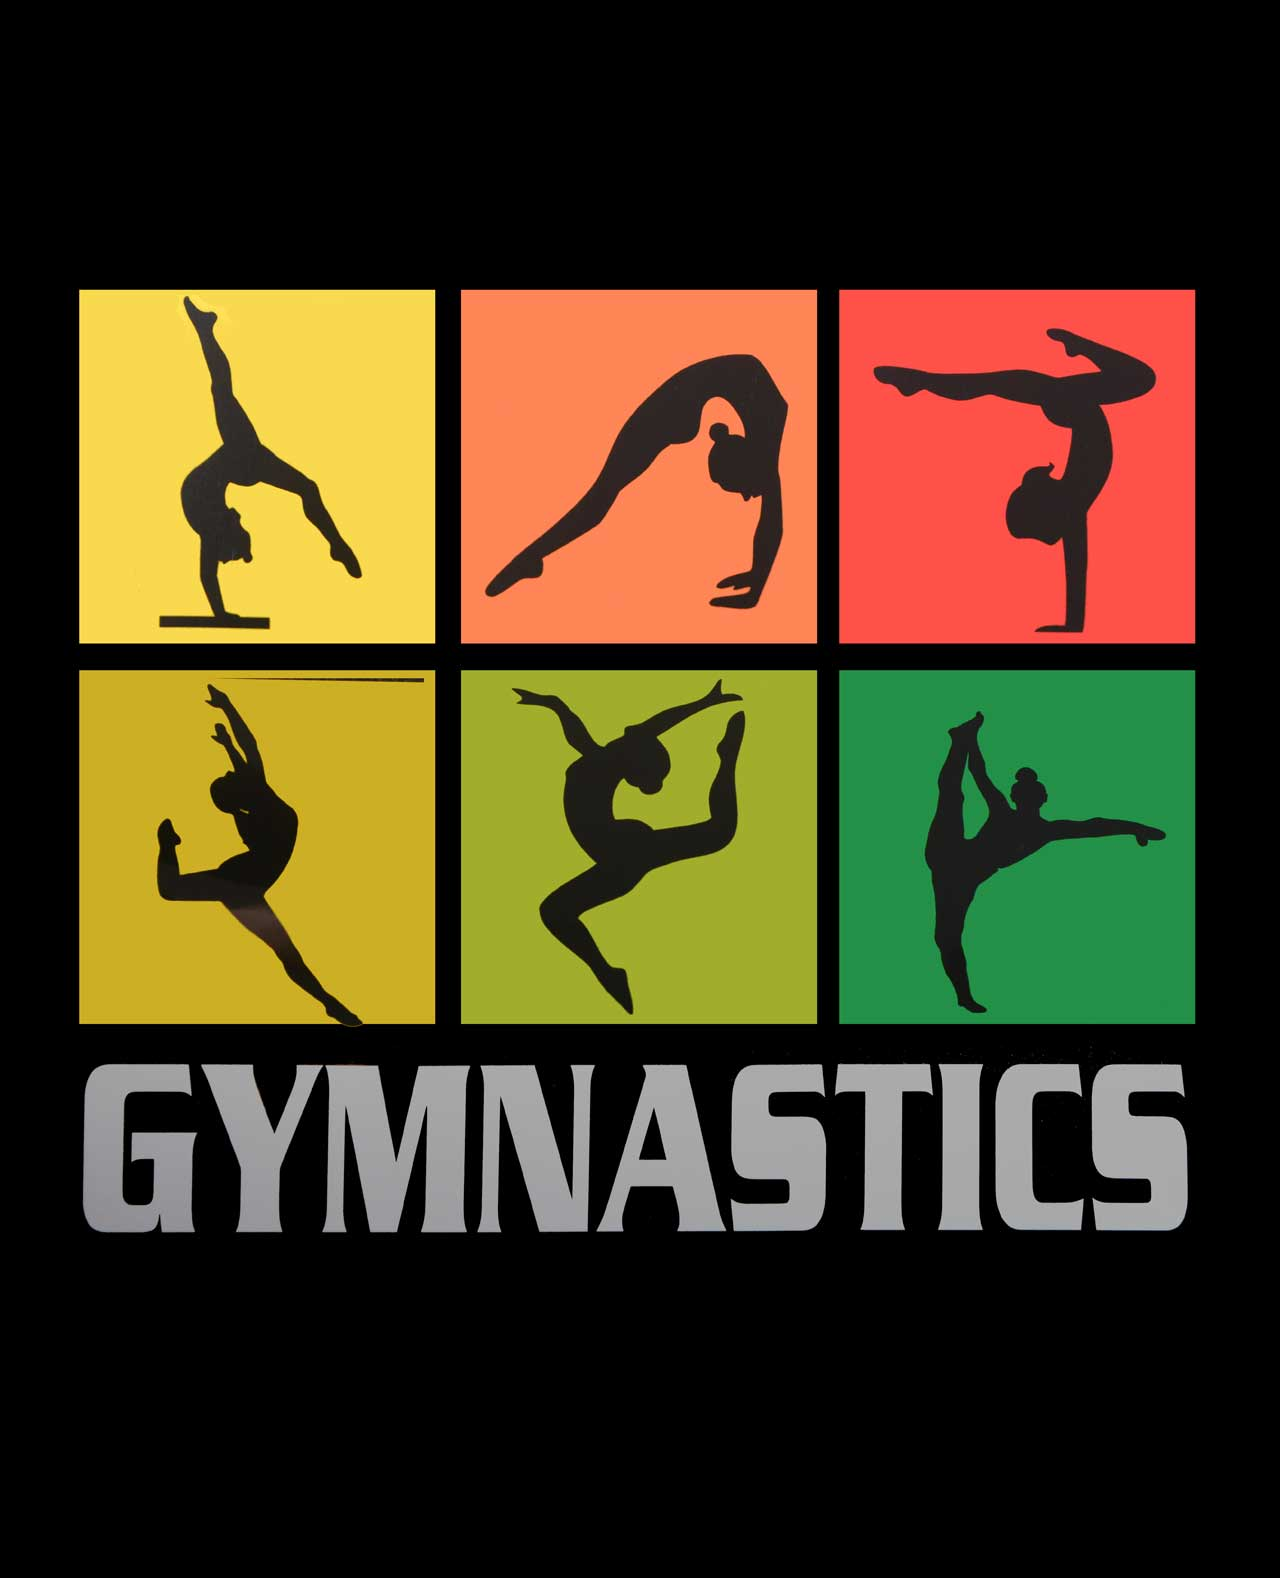 B36 Gymnast Silhouette